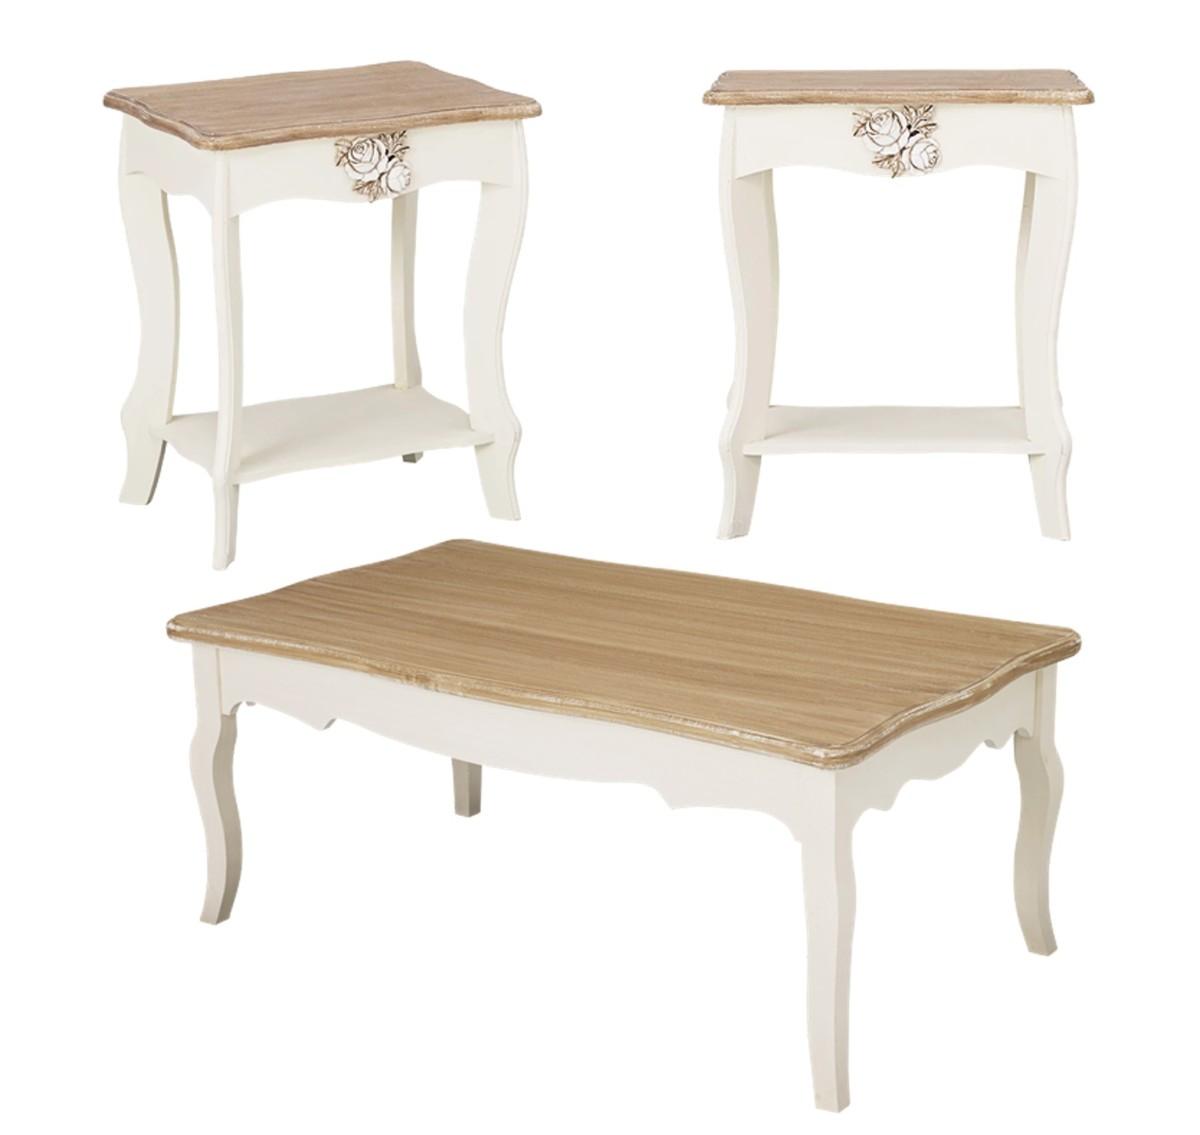 Win £100 Furniture Voucher With Matalan Furniture